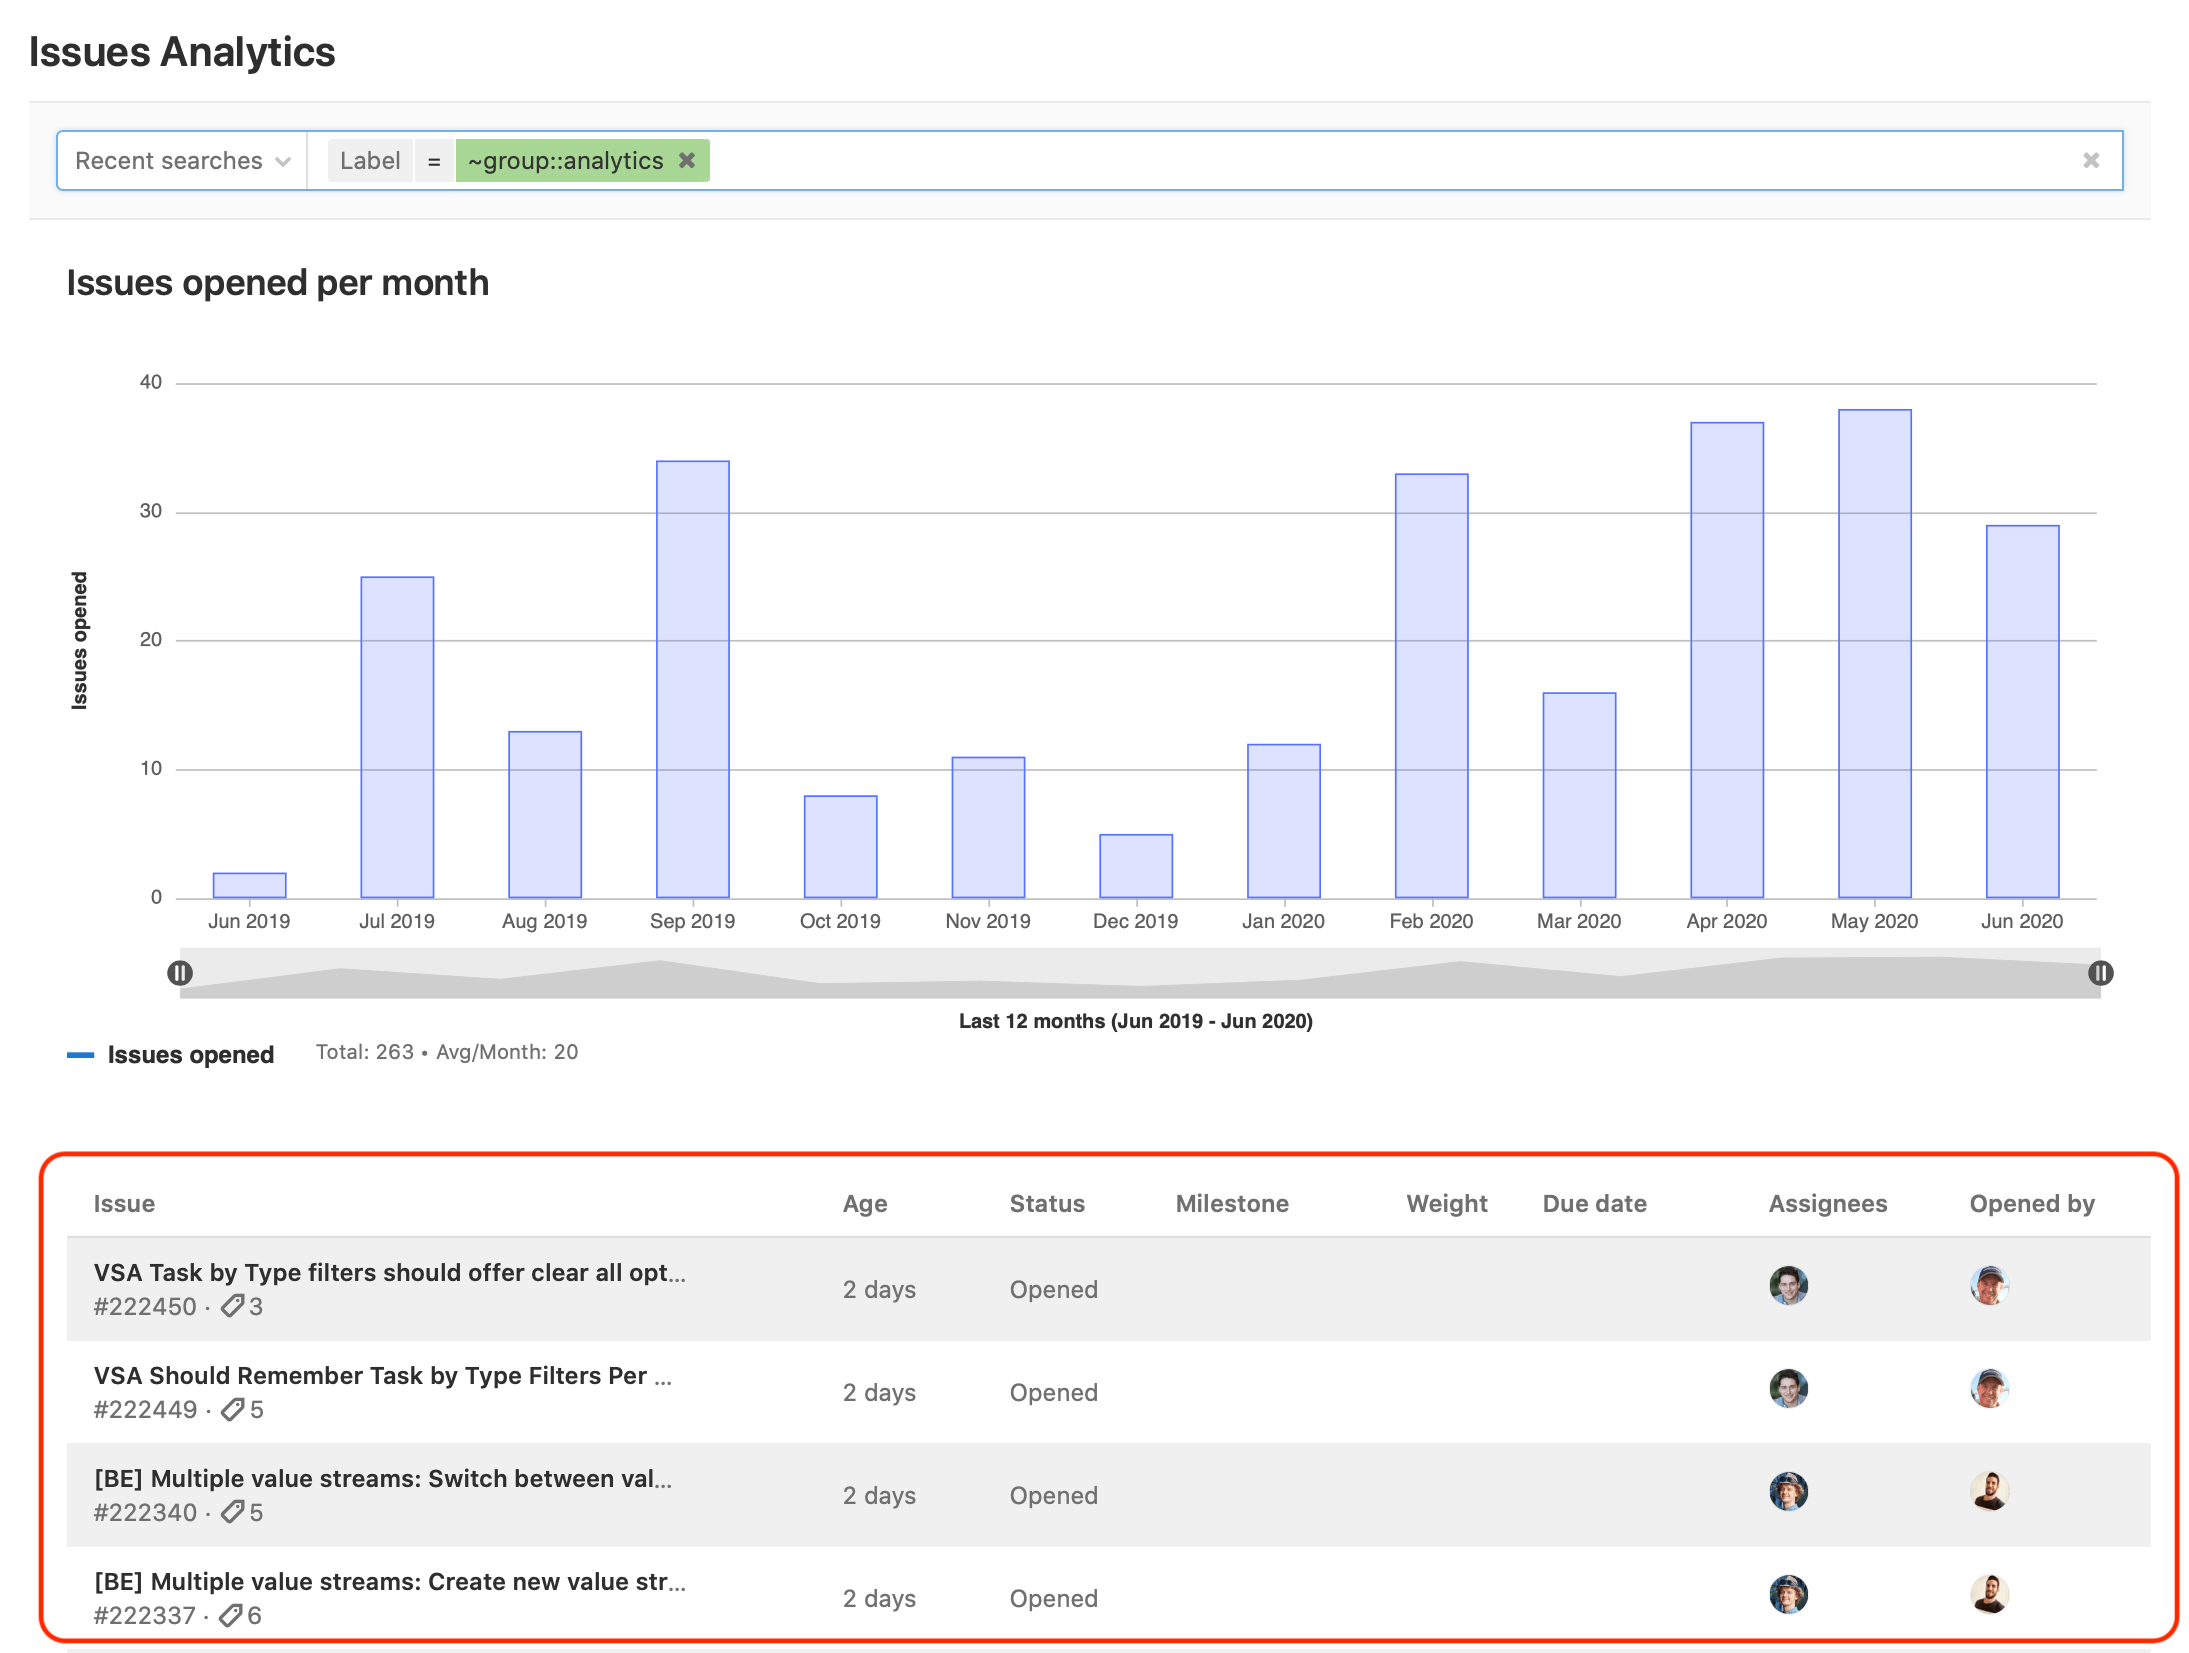 Explore Trends & Details in Issue Analytics